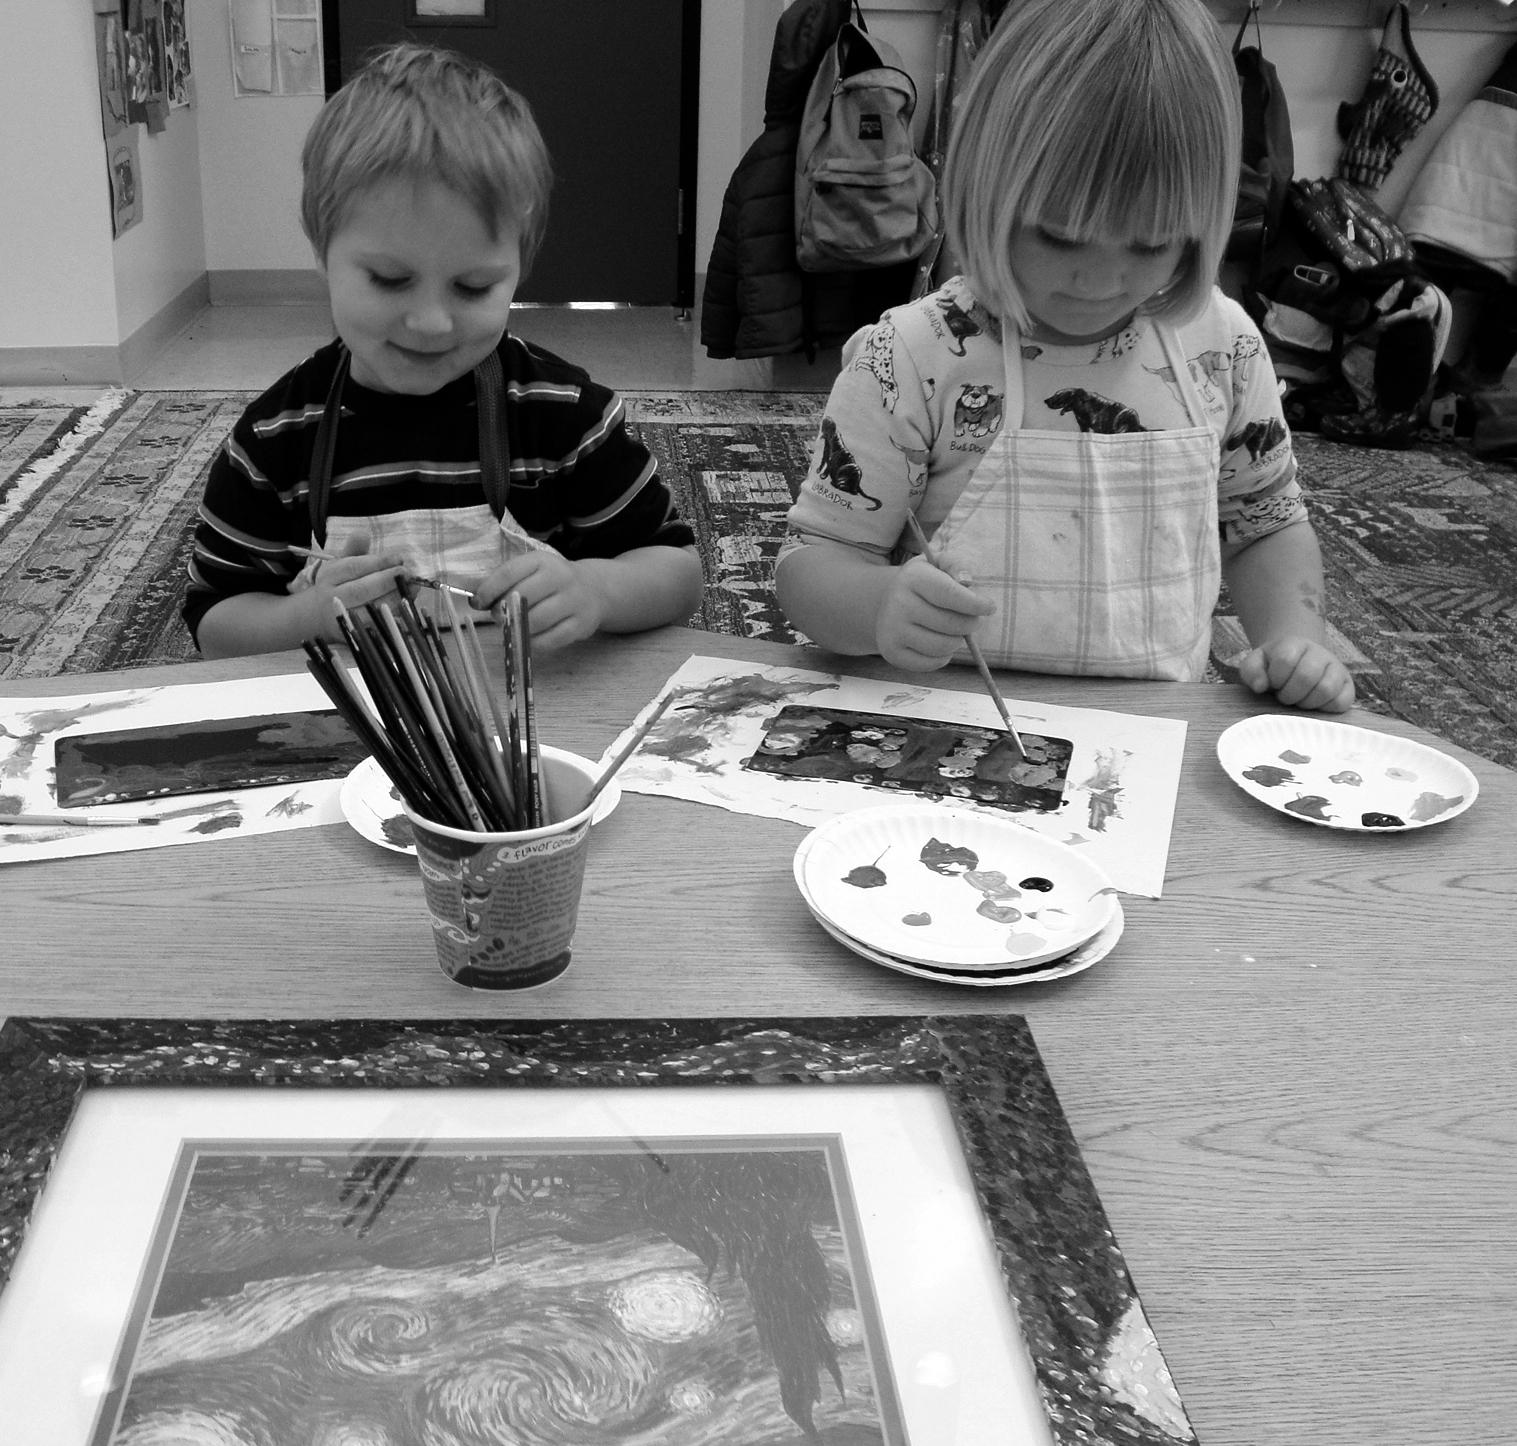 van Gogh Starry Night 2012 Bennett and Lucy gray.JPG